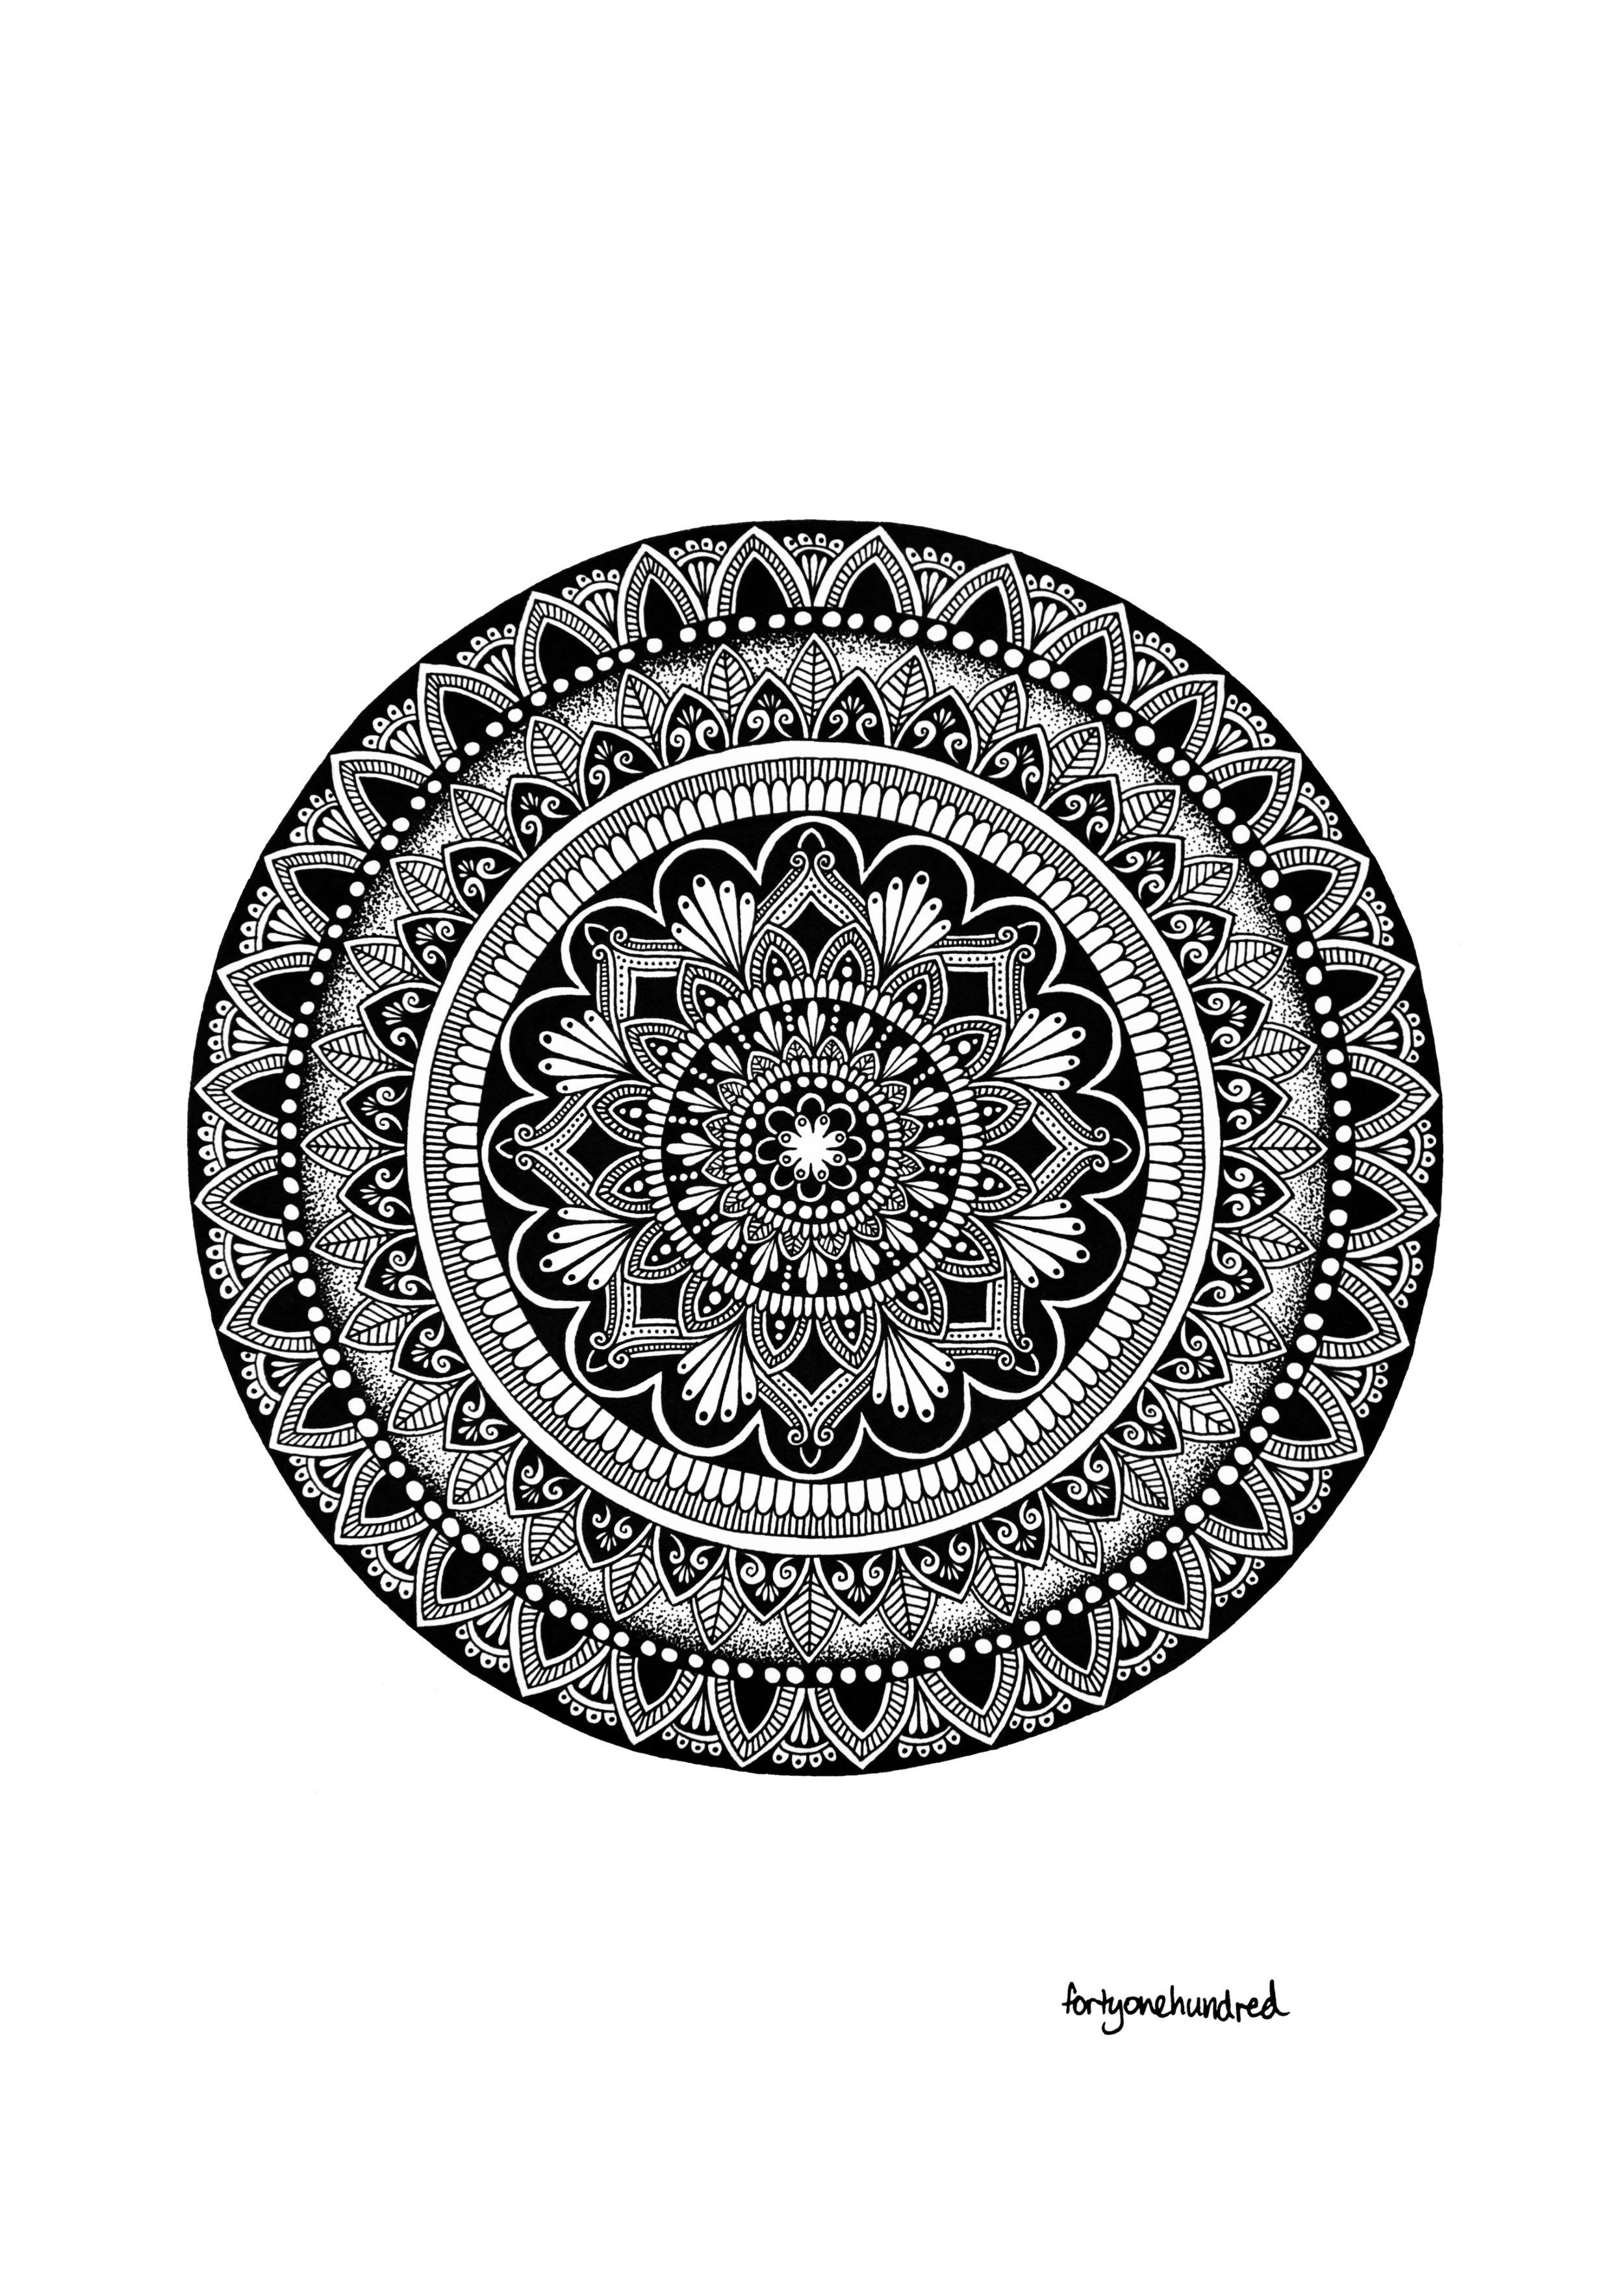 Meditation Mandala by fortyonehundred.jpg